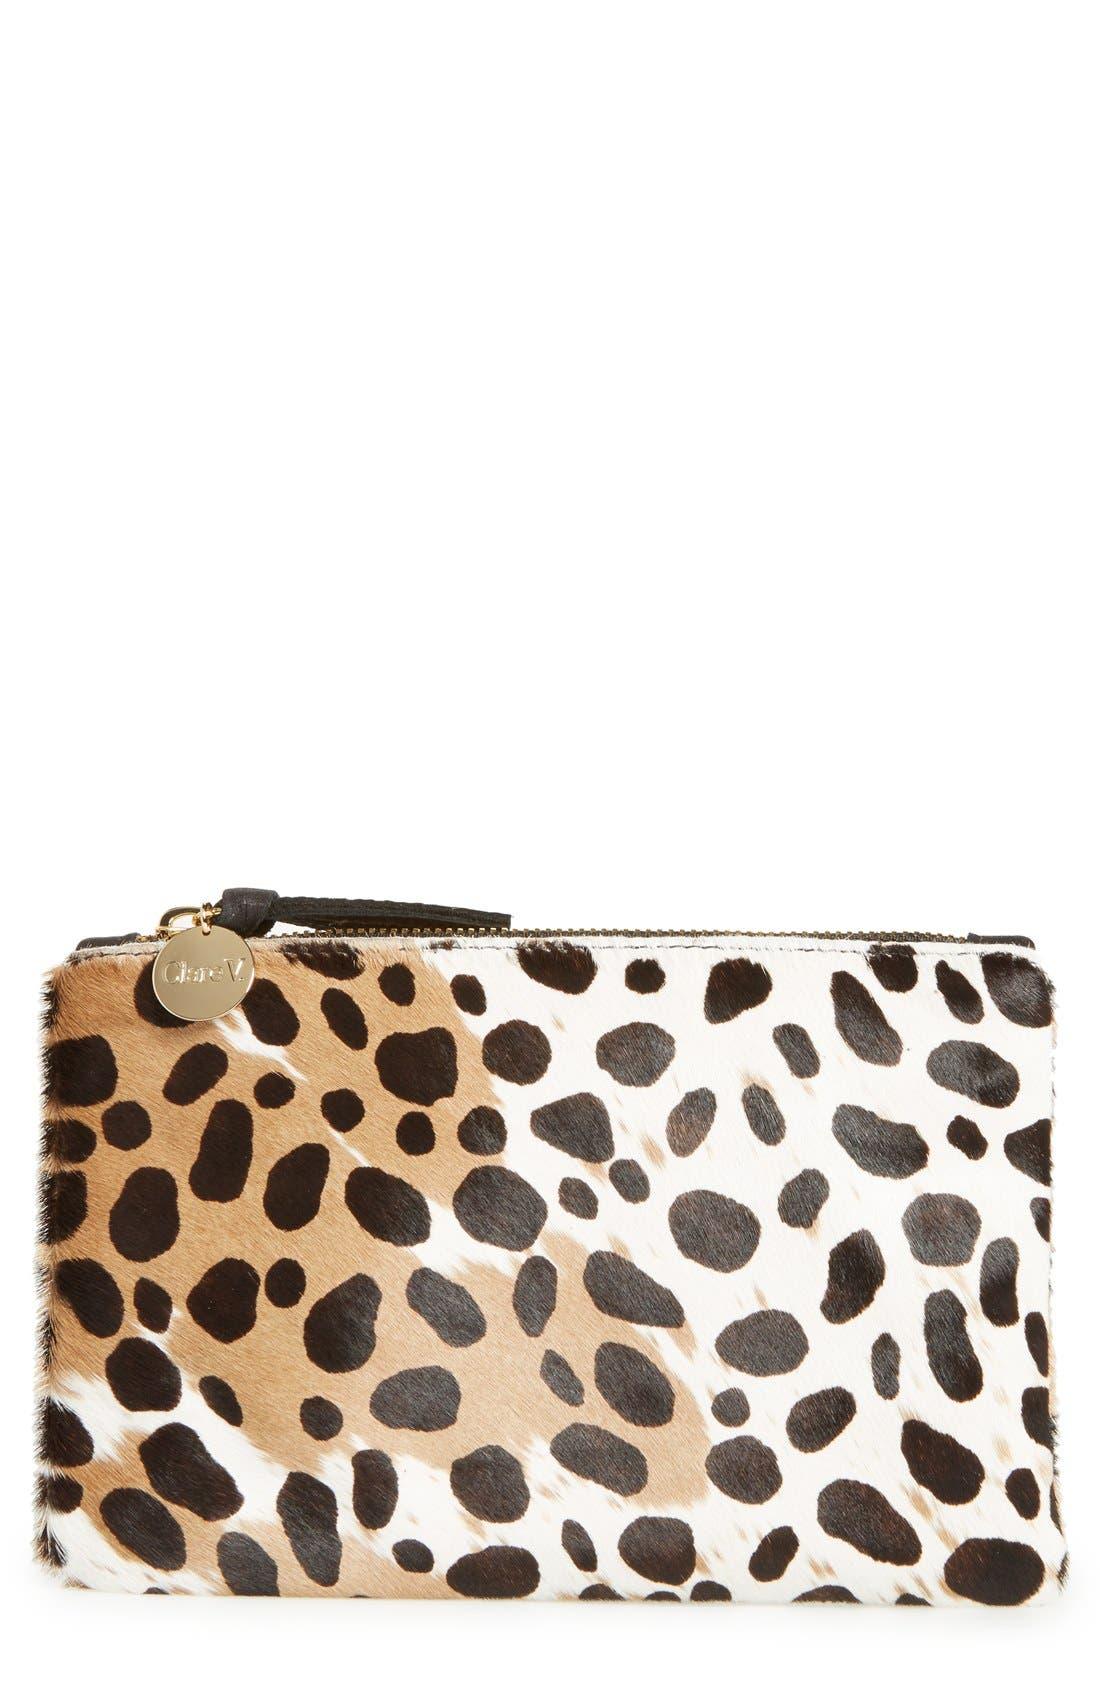 CLARE V. Core Leopard Print Genuine Calf Hair Pouch